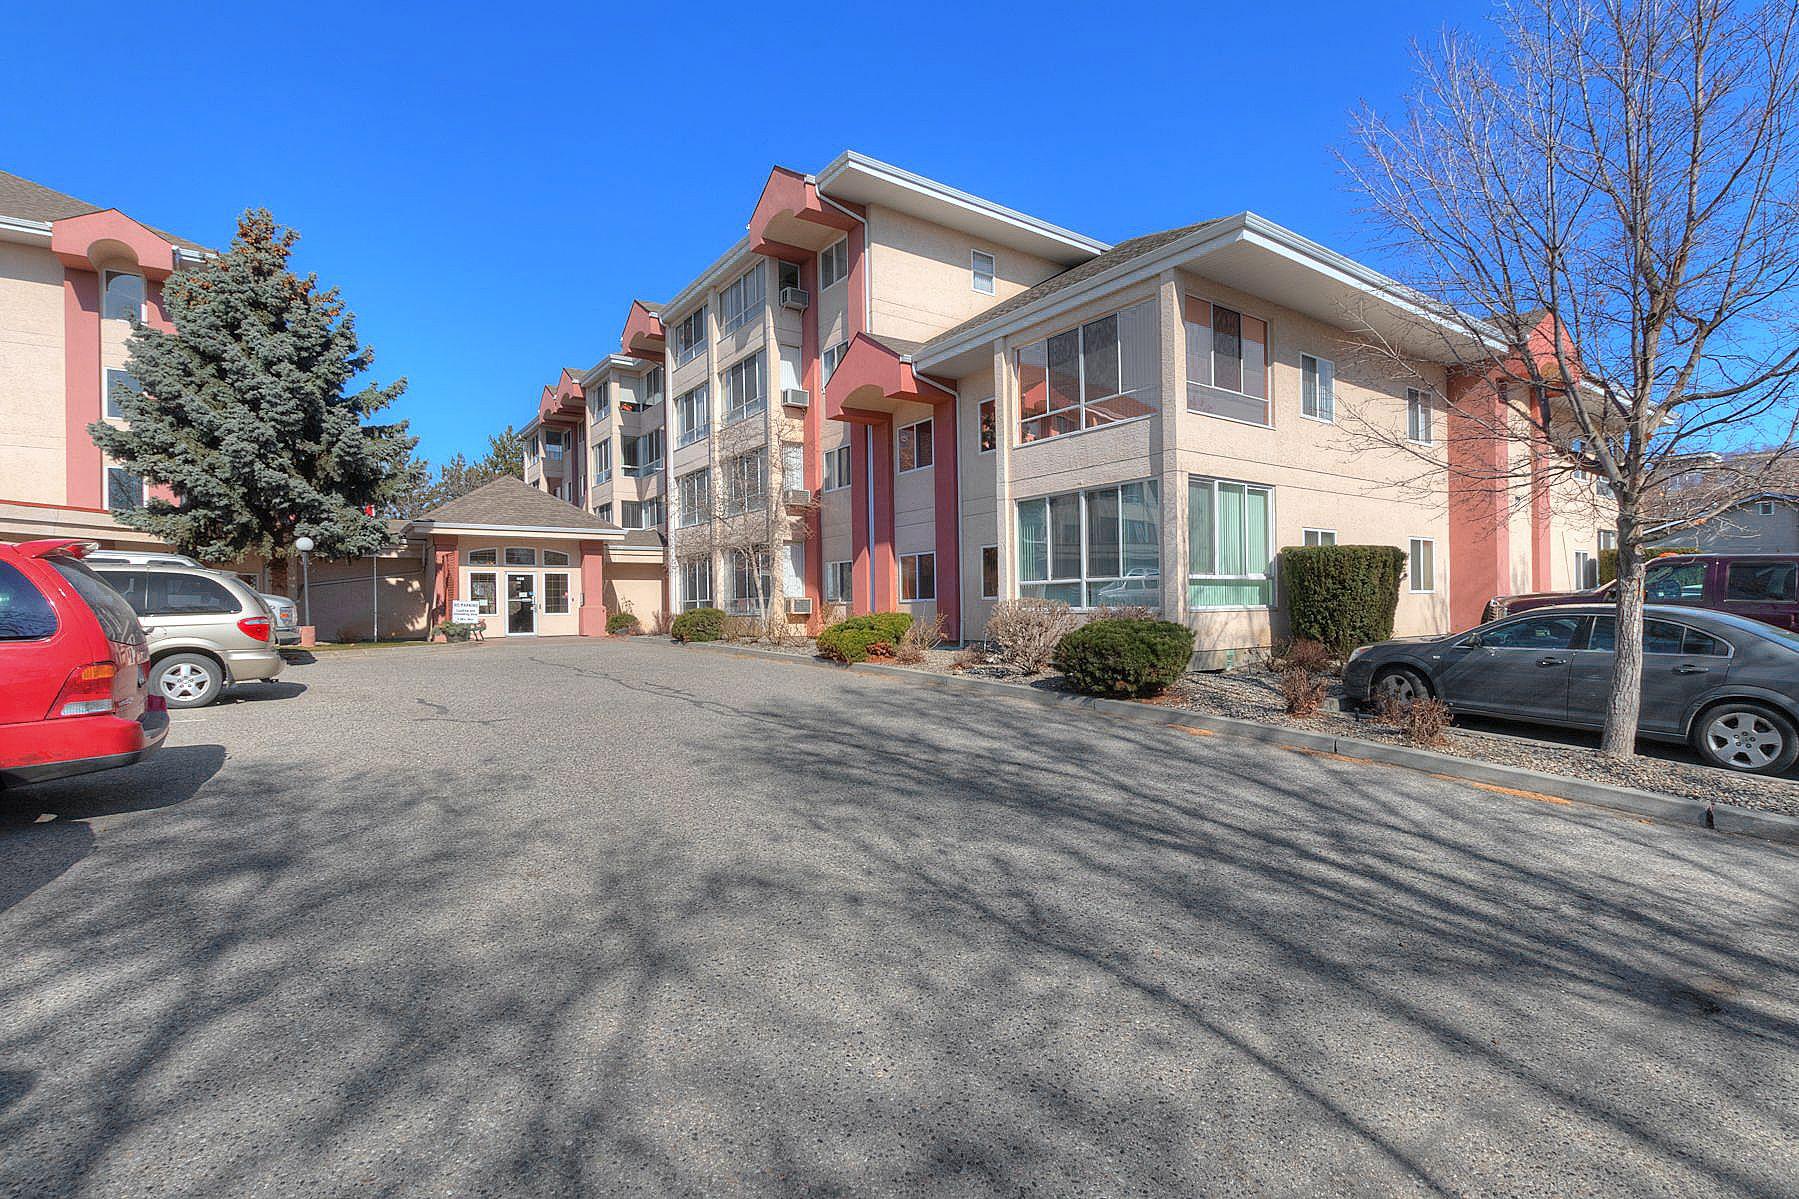 Main Photo: 206 920 Saskatoon Road in Kelowna: Rutland South Multi-family for sale (Central Okanagan)  : MLS®# 10211030